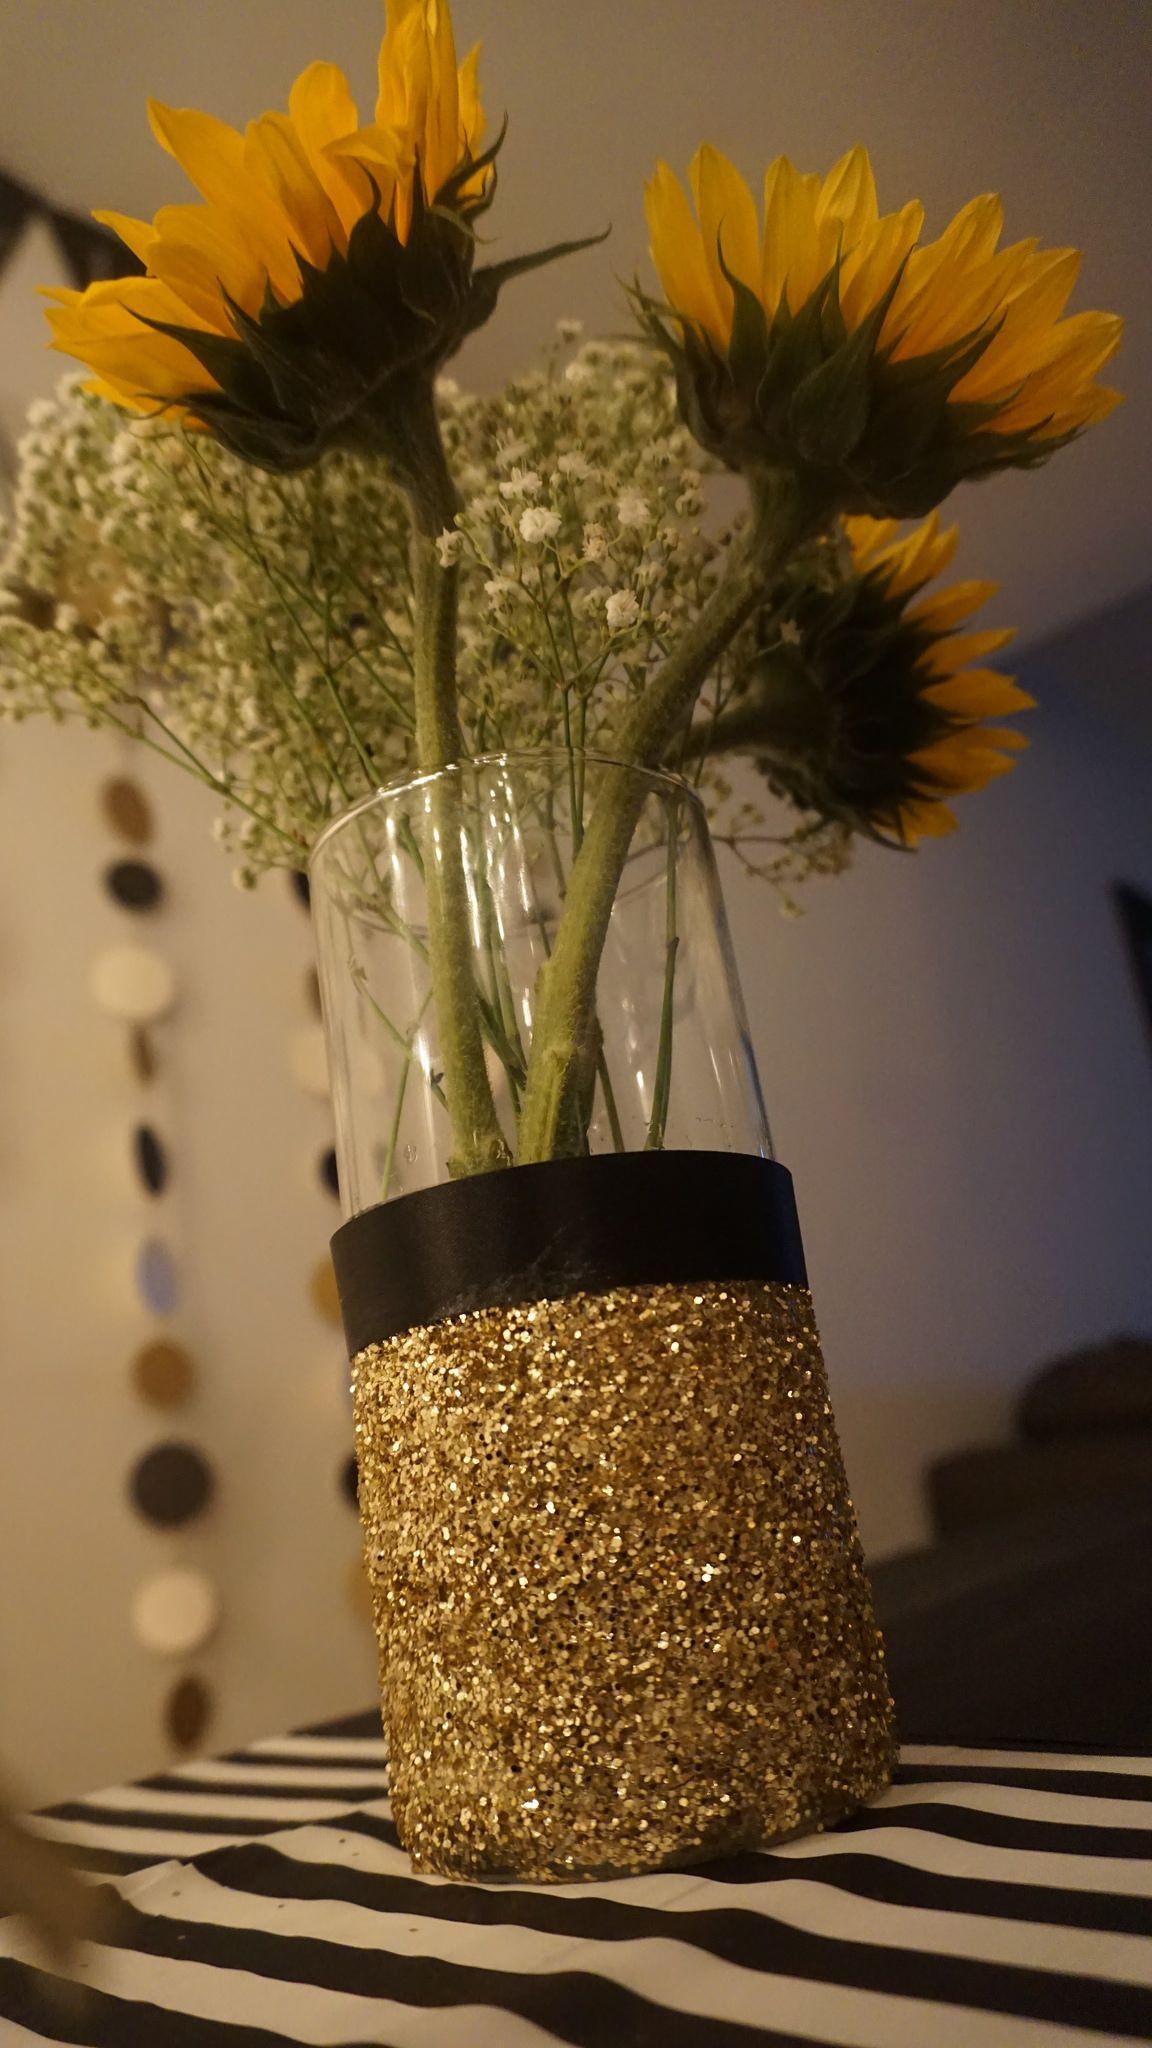 Gold Glitter Vase Of Gold Glitter Vases Photograph Diy Gold Glitter Vase Black White and Pertaining to Diy Gold Glitter Vase Black White and Gold Birthday Party